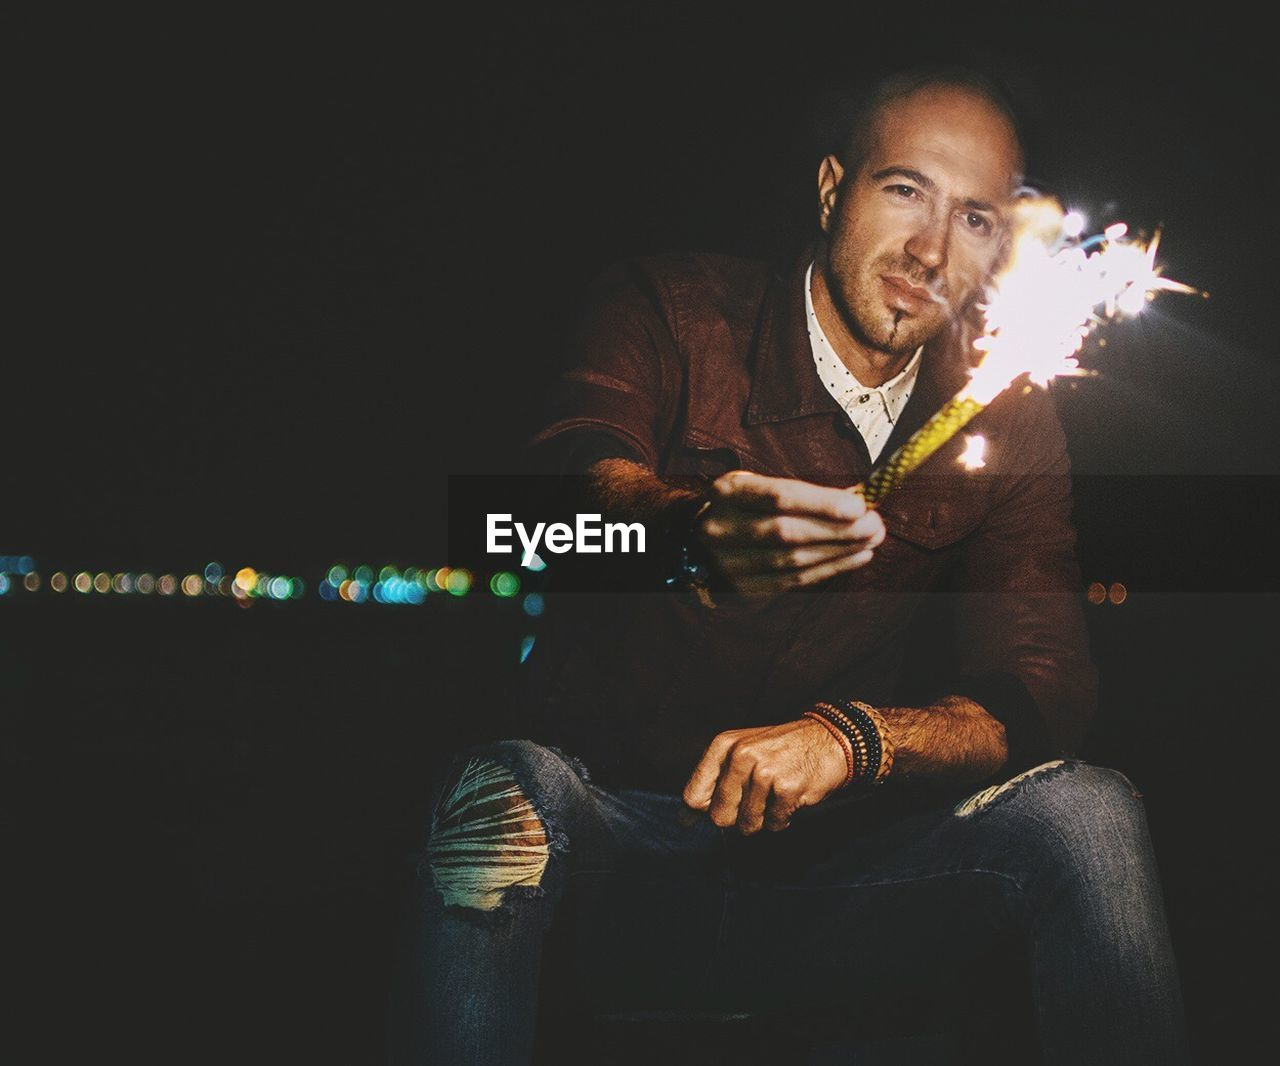 Man Holding Illuminated Cracker At Night